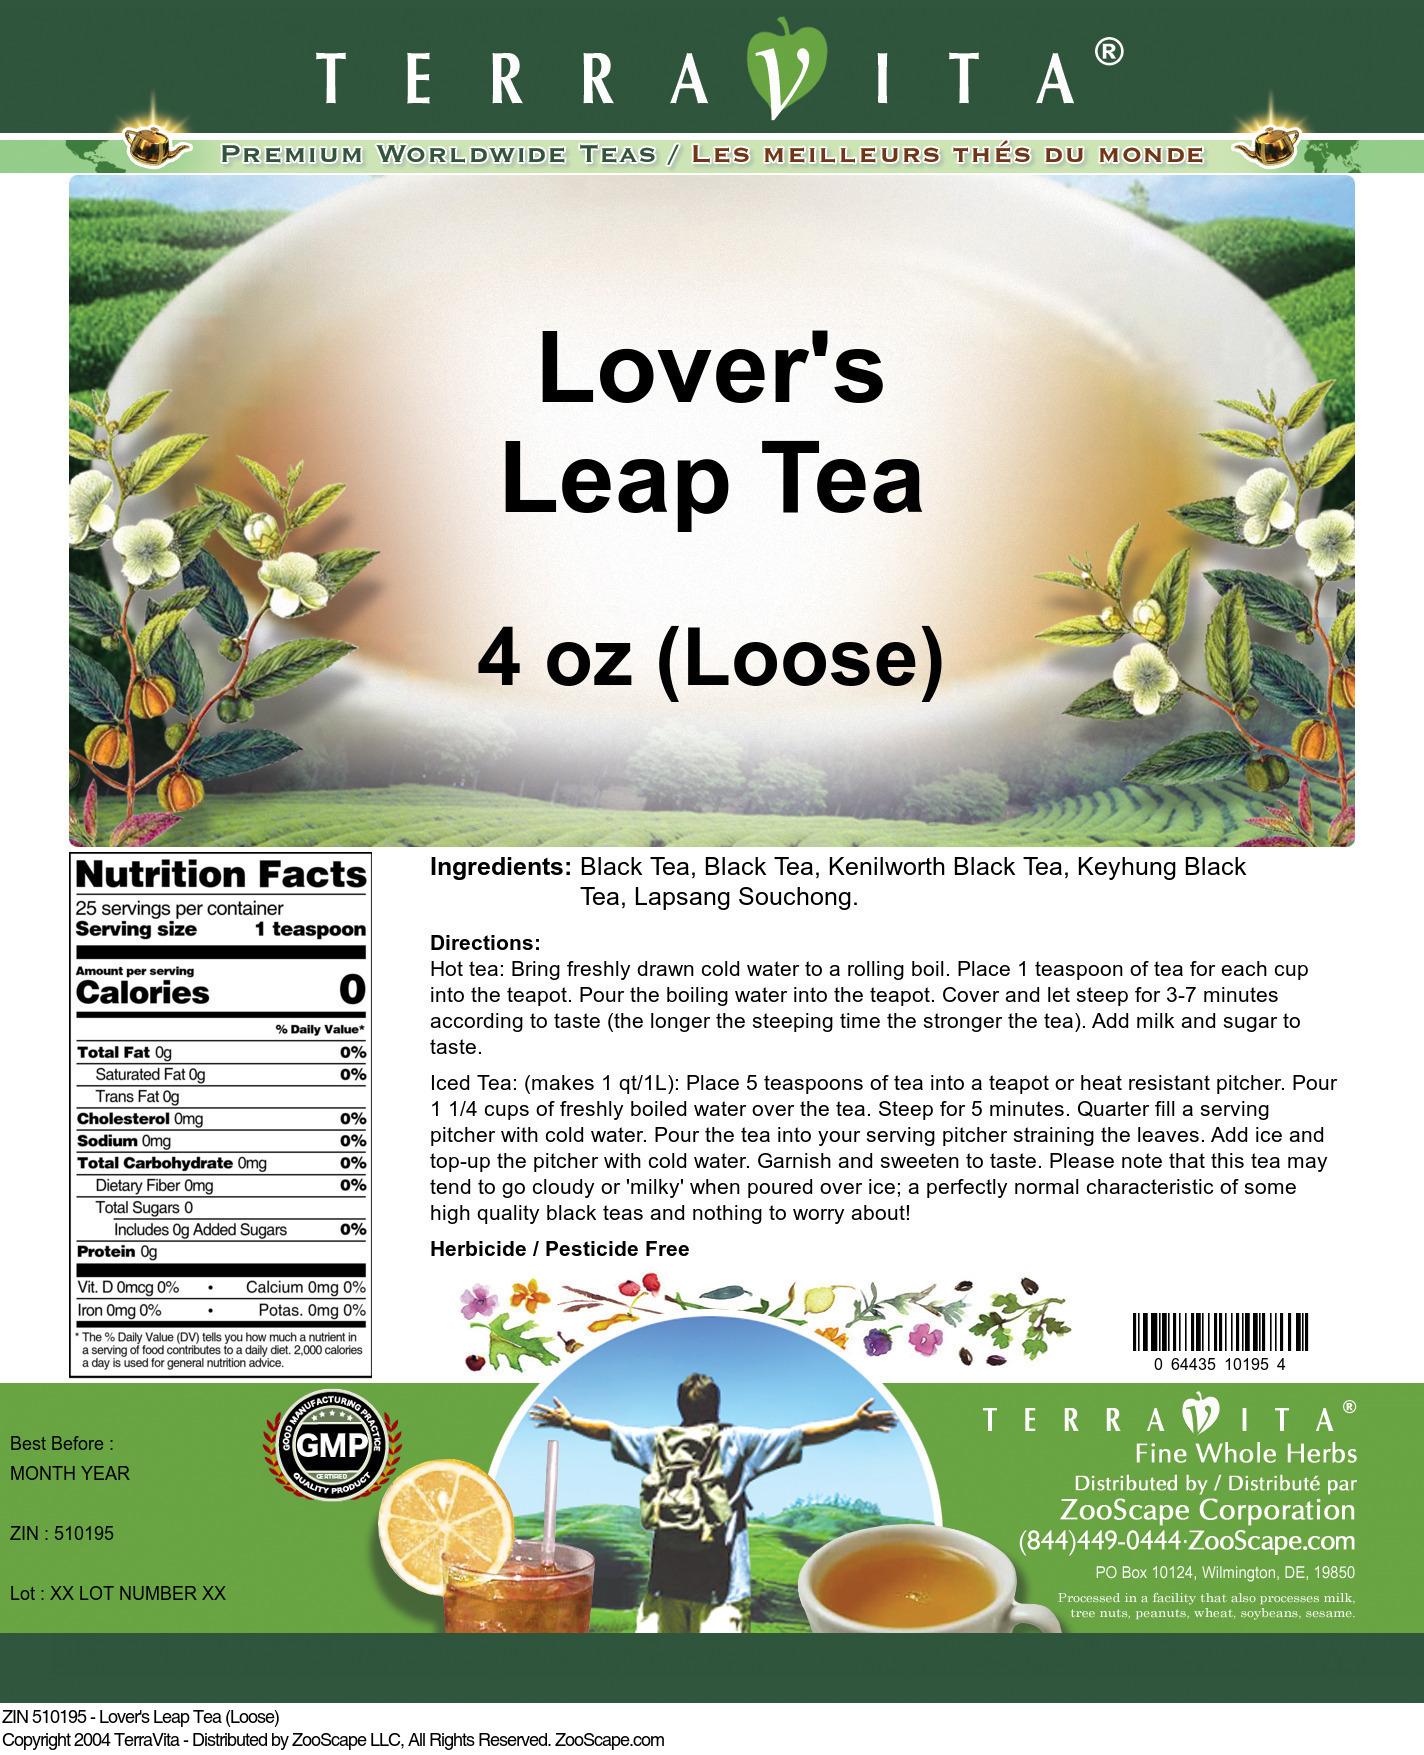 Lover's Leap